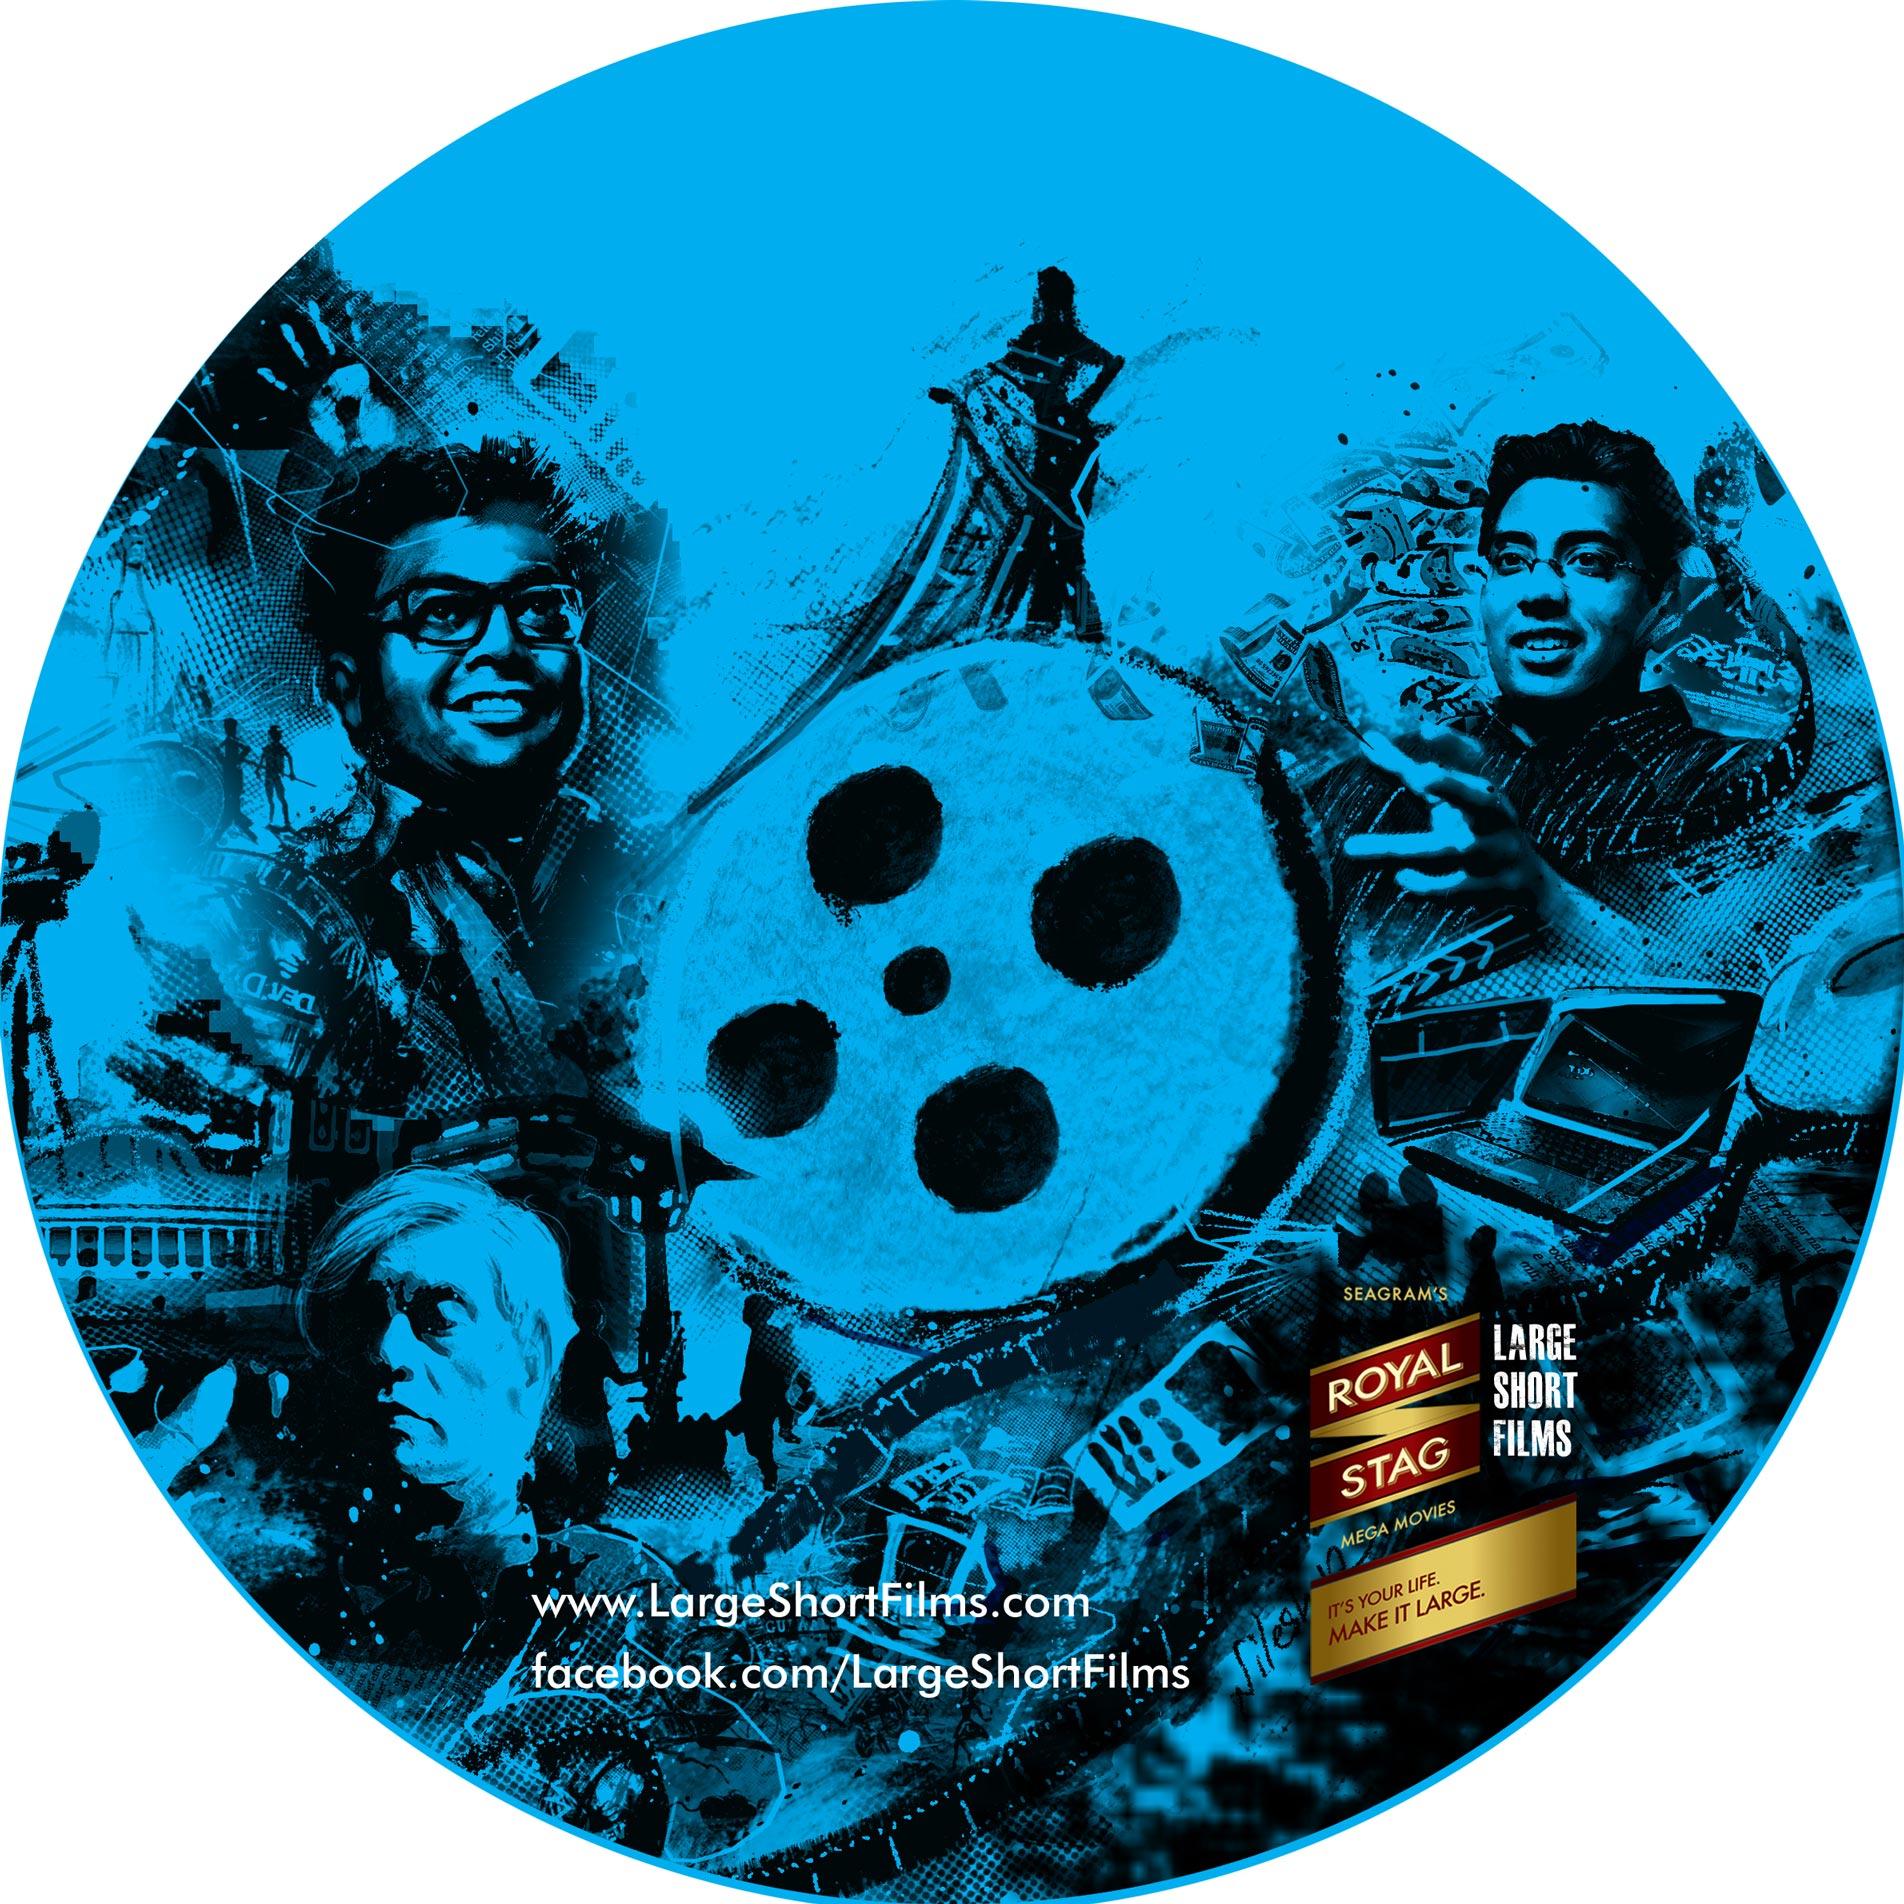 royal-stag-large-short-films-anurag-kashyap-chakri-toleti-sudhir-mishra-mouse-pad